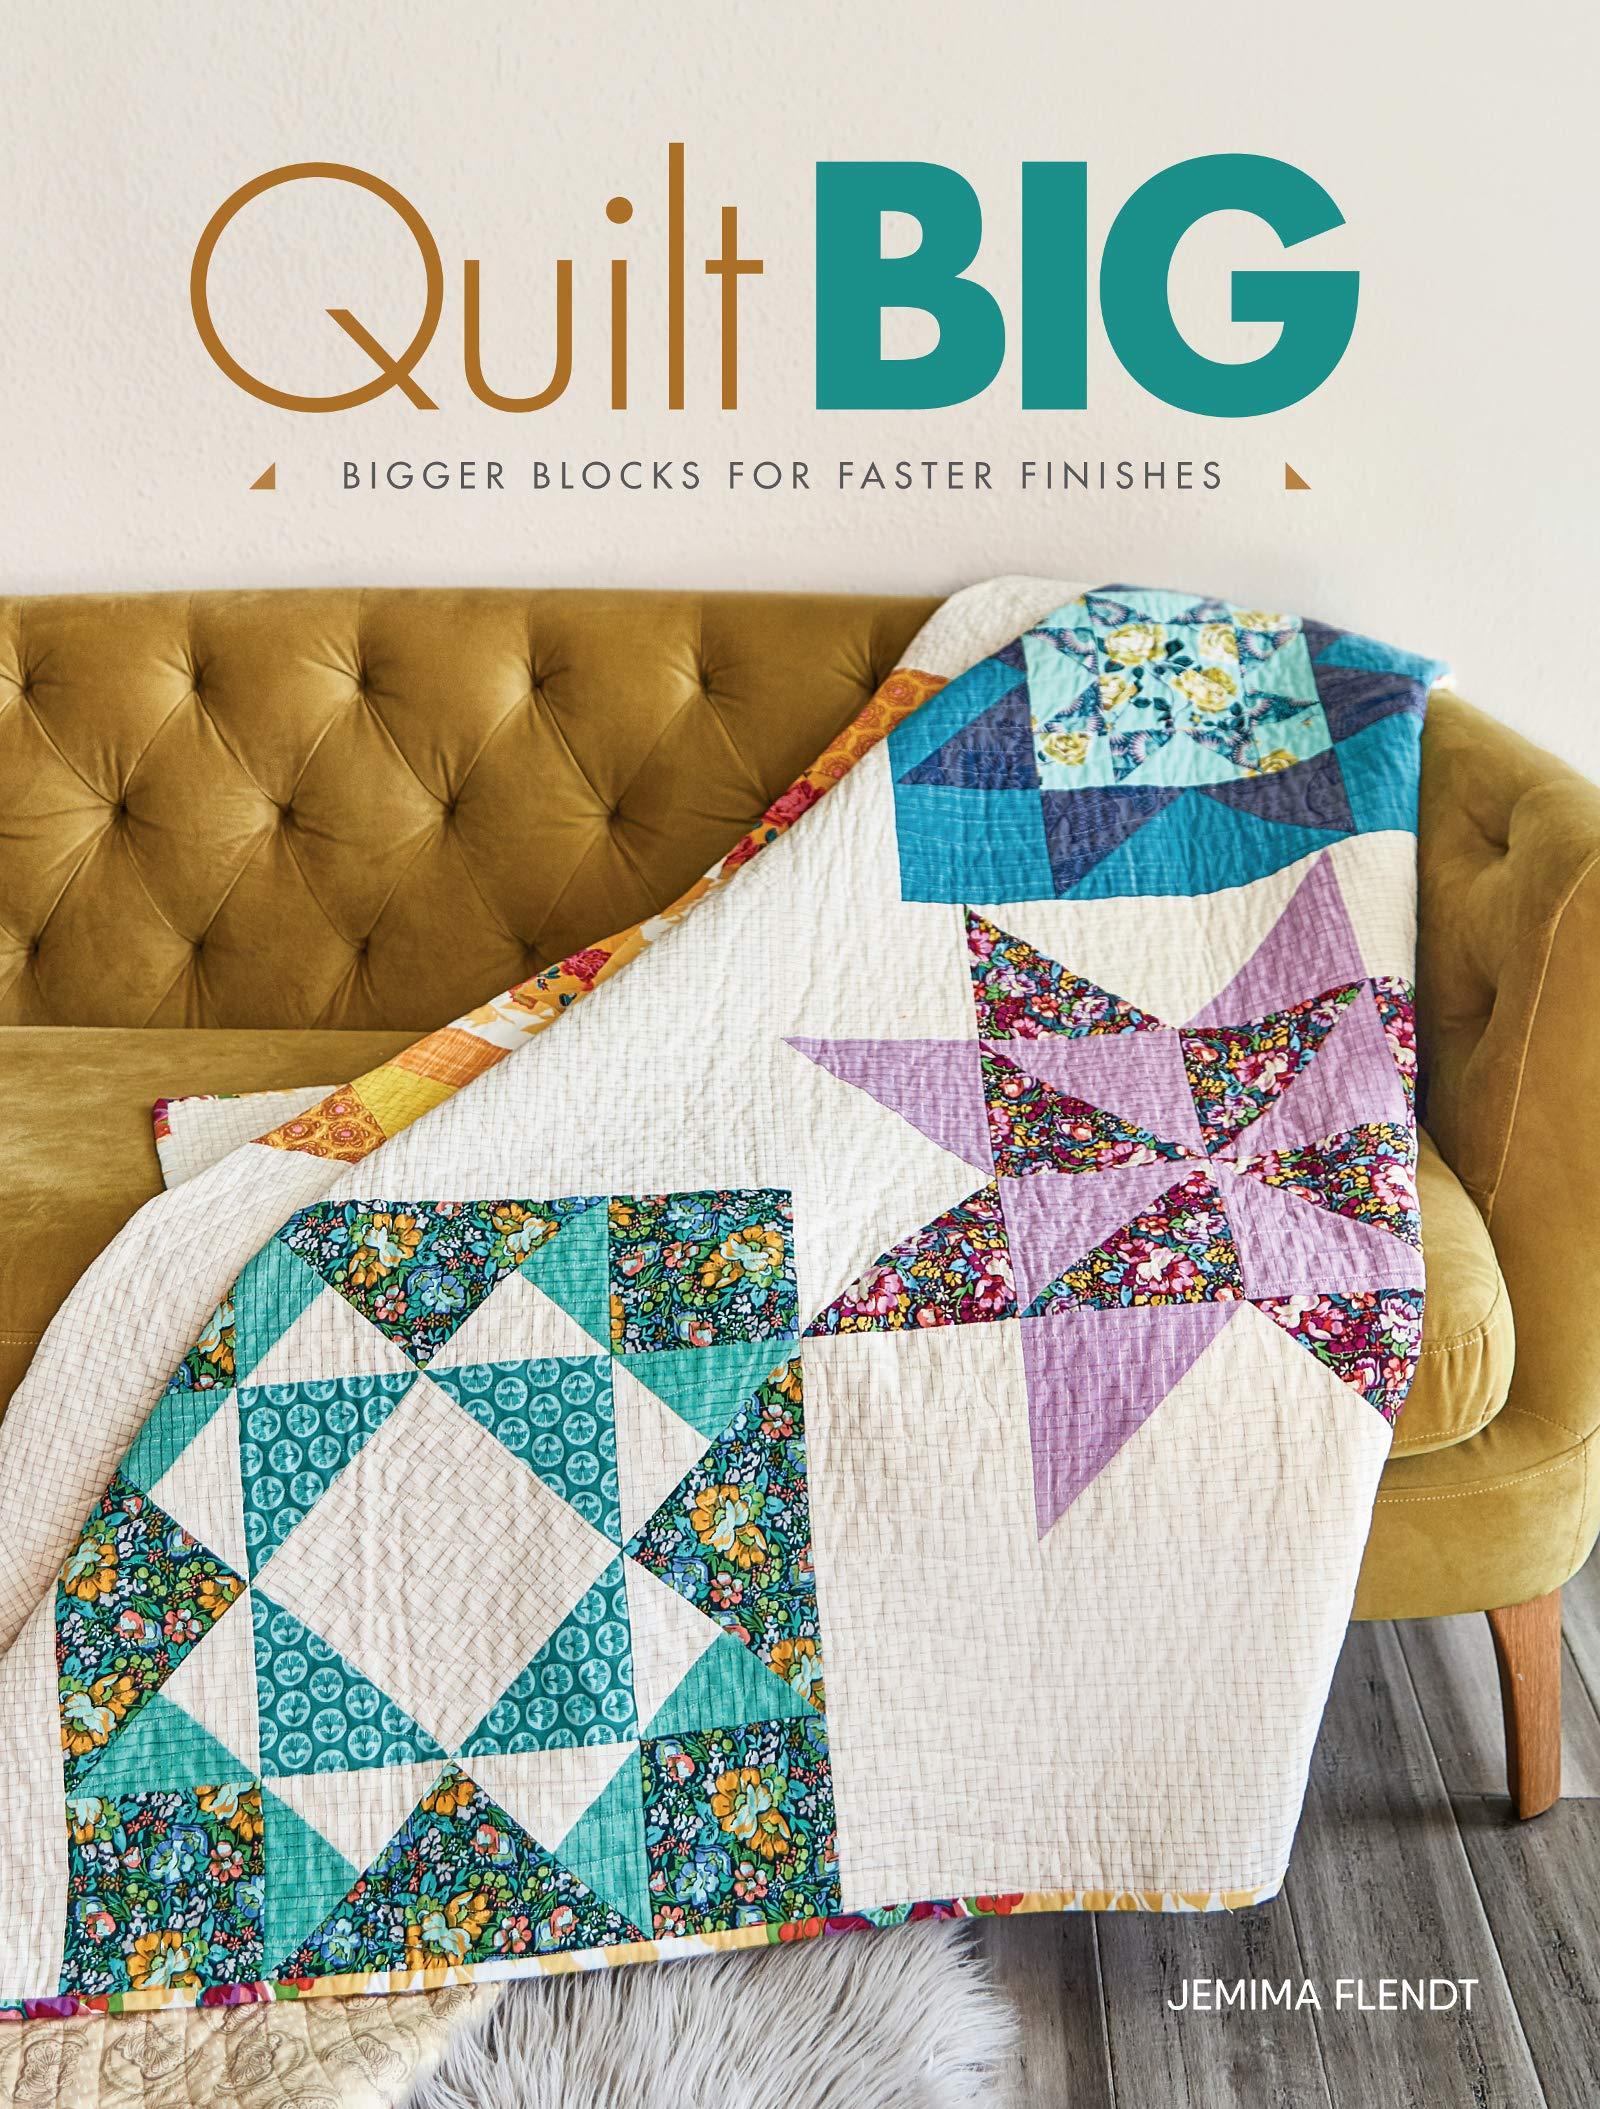 Big Block Quilt Patterns – FREE PATTERNS